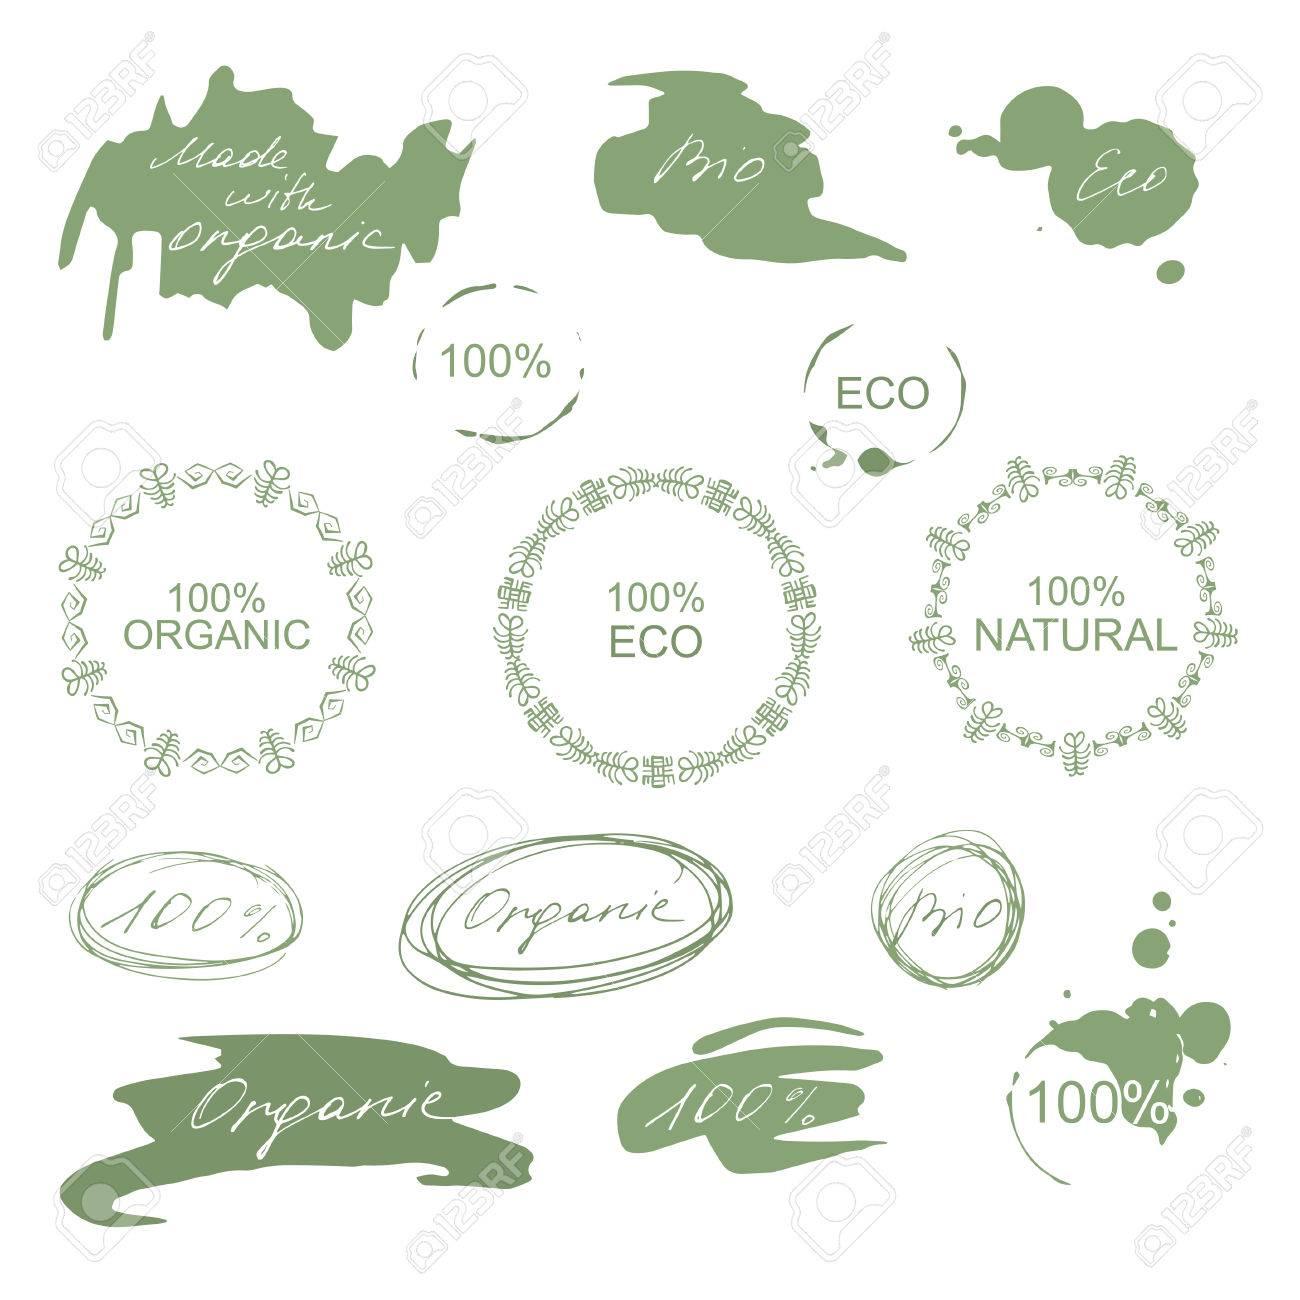 Set Of Natural Organic Eco Badges And Green Labels. Vector ...